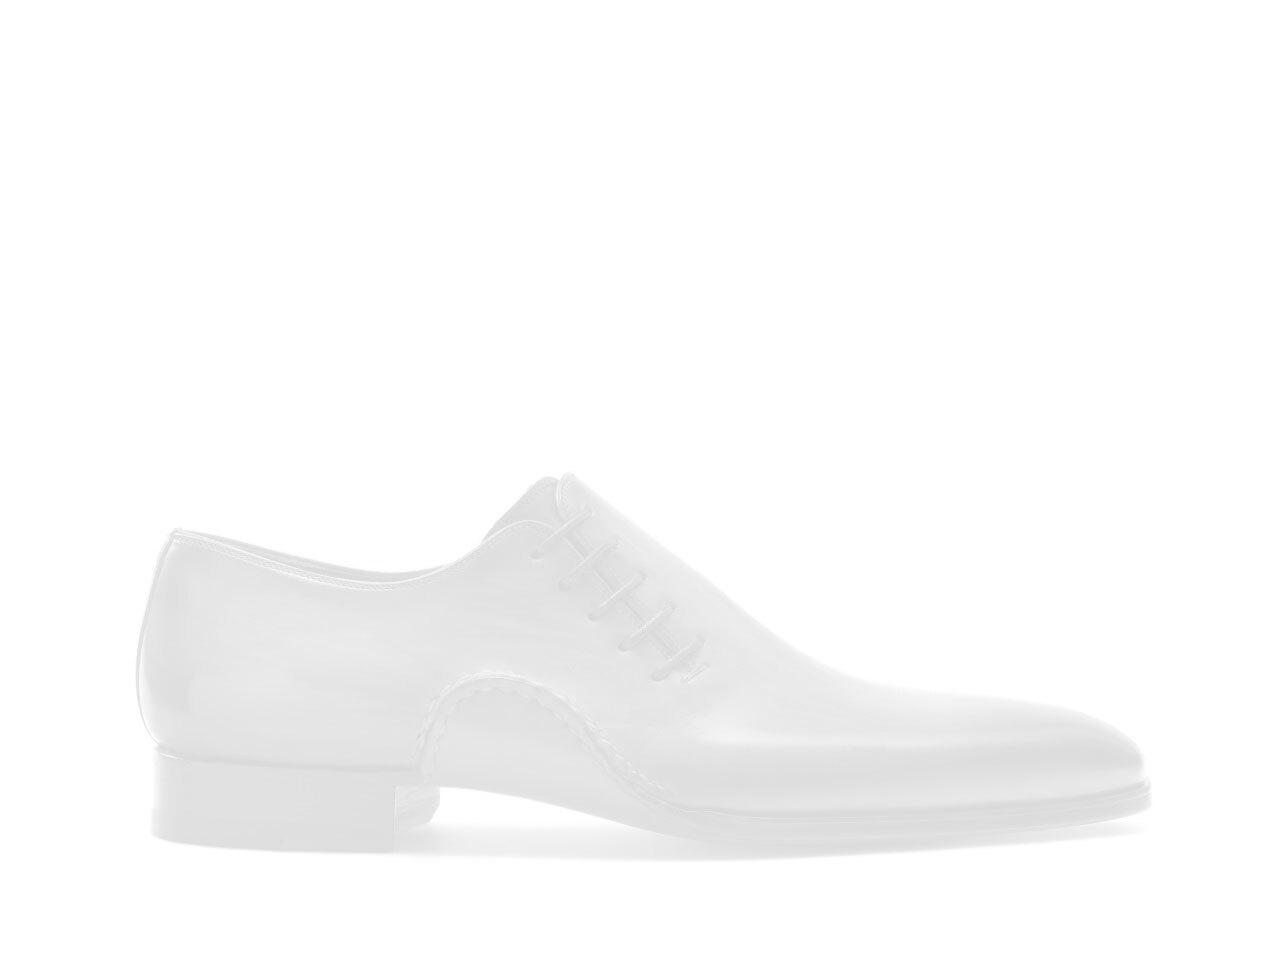 Pair of the Magnanni Echo Lo Grey Men's Sneakers